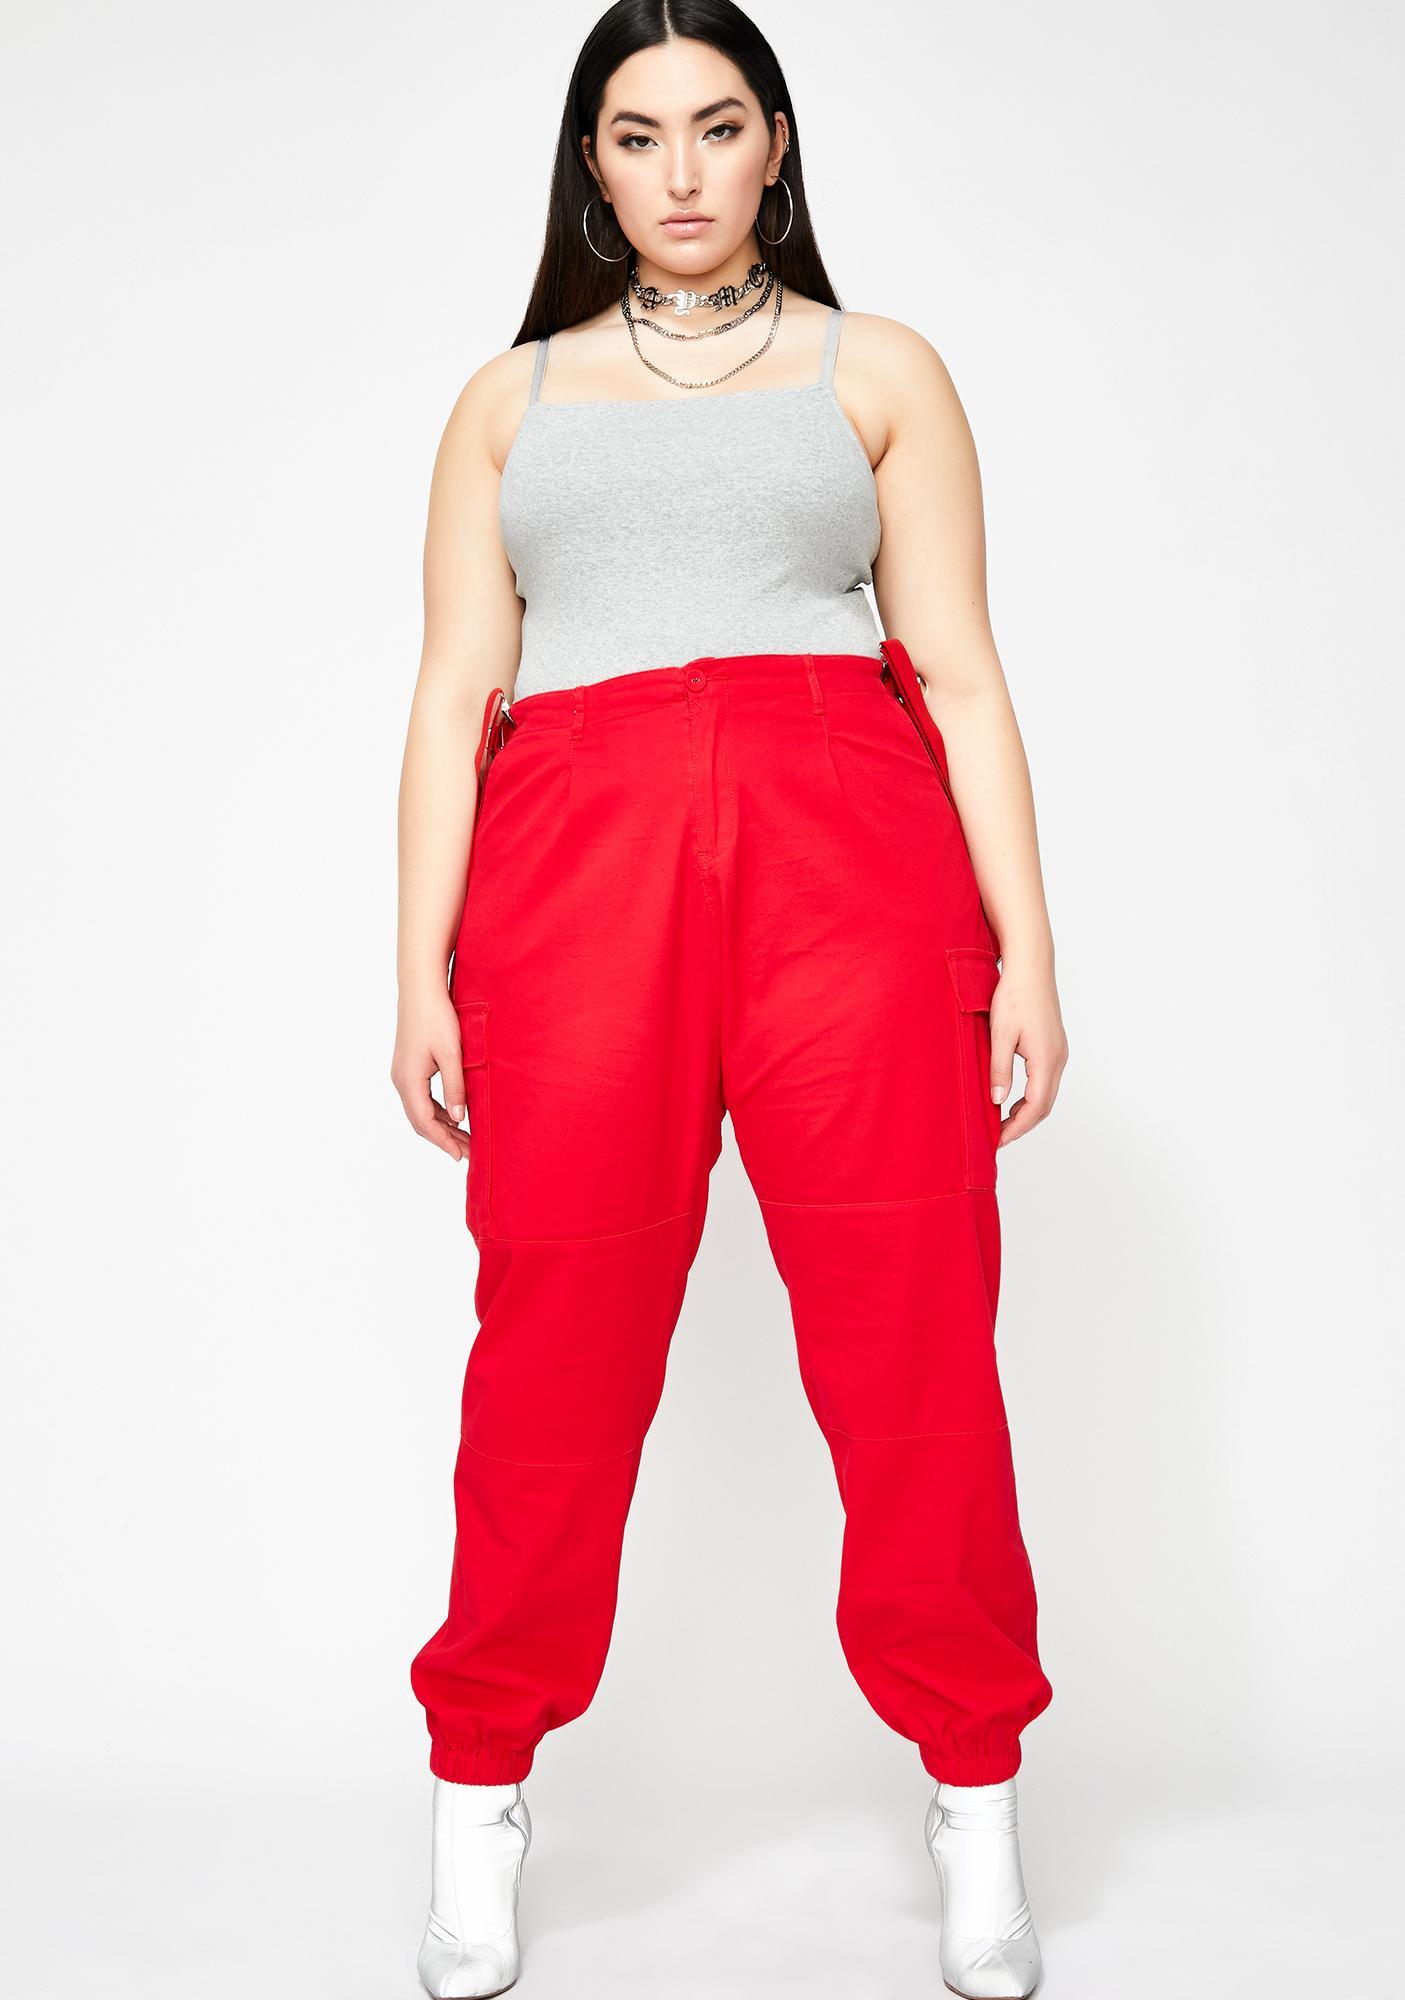 Poster Grl Rich Supermodel Ribbed Bodysuit